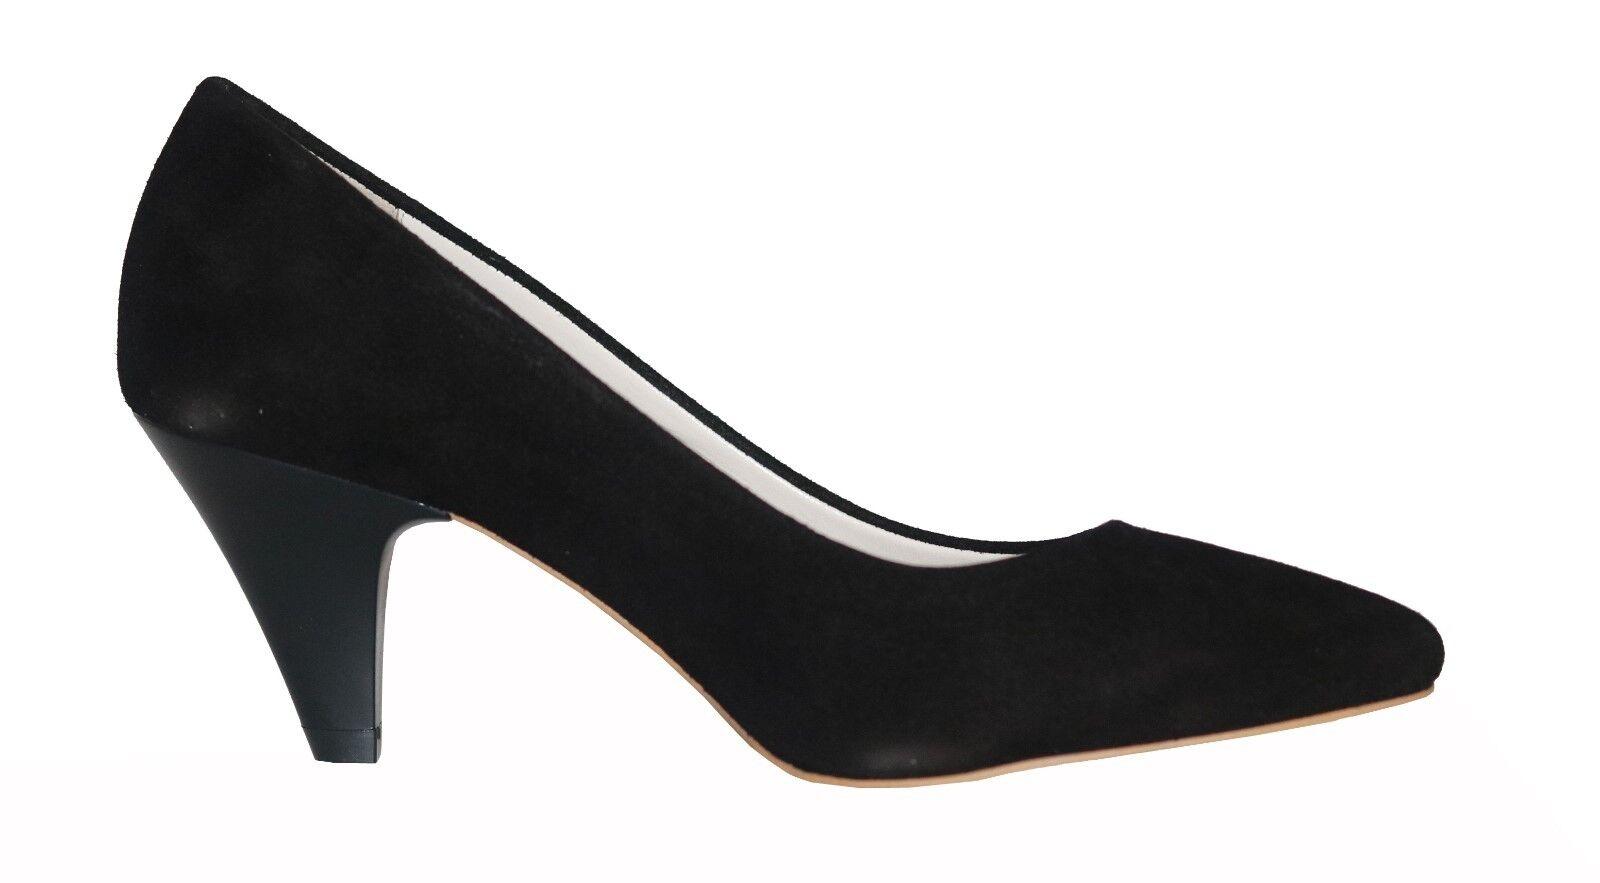 Nubukleder Damen Schuhe Pumps Gr.39 Schwarz